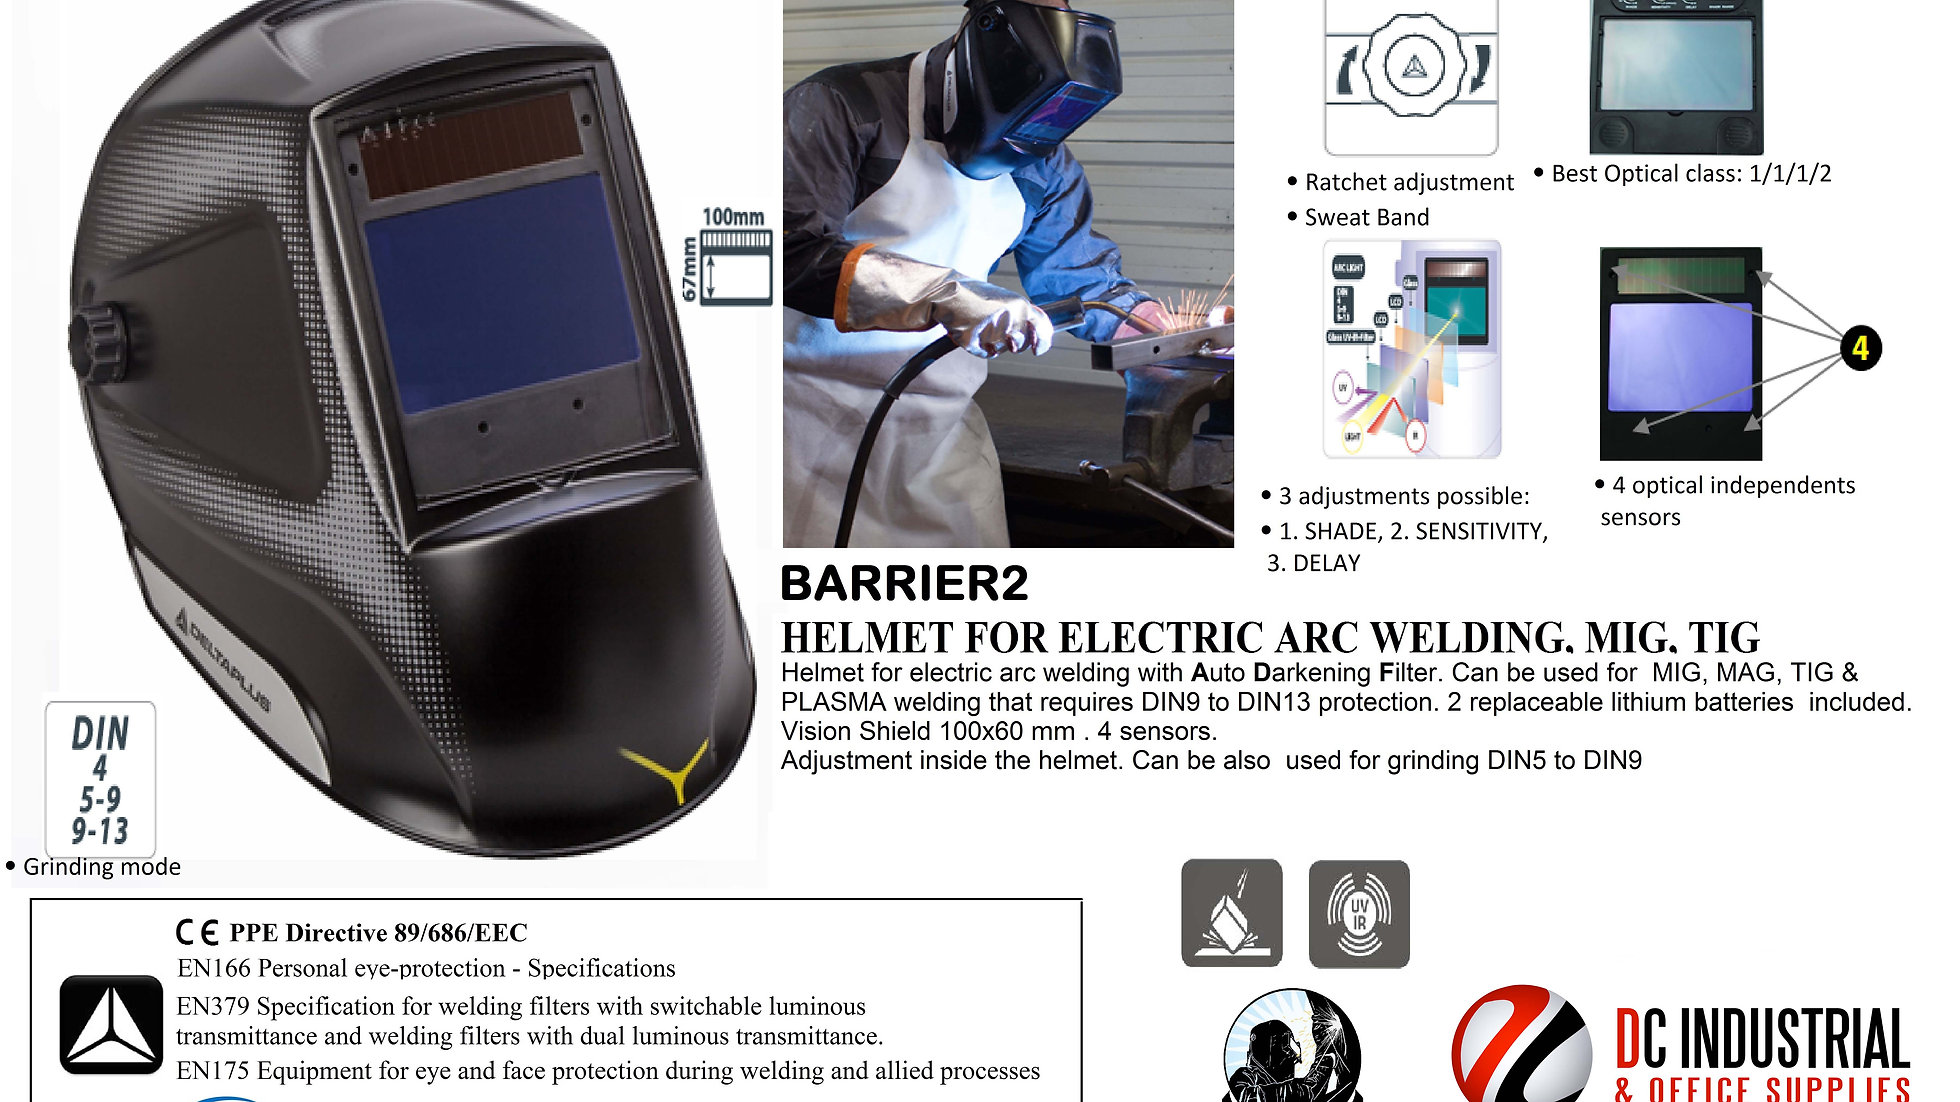 BARRIER2 HELMET FOR ELECTRIC ARC WELDING  MIG  TIG  | website